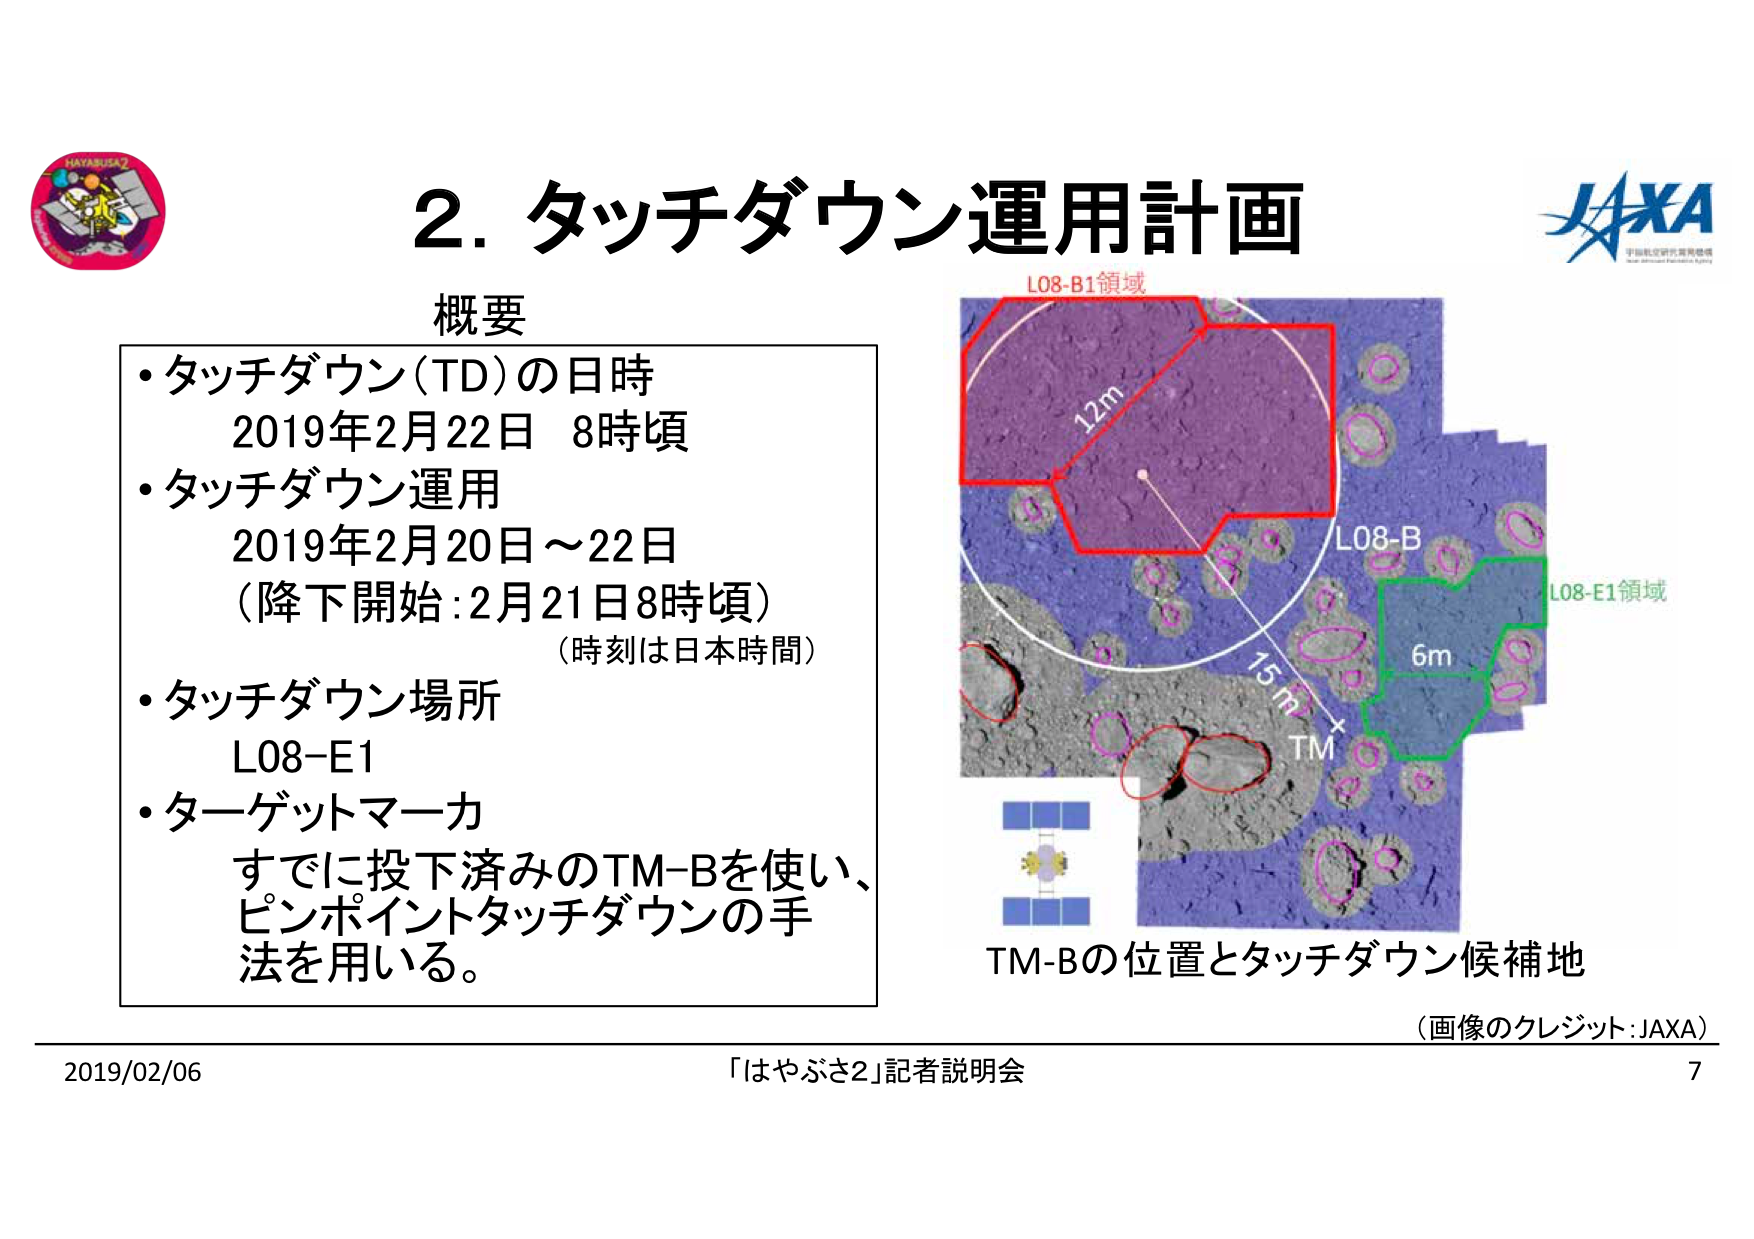 f:id:Imamura:20190204175501p:plain